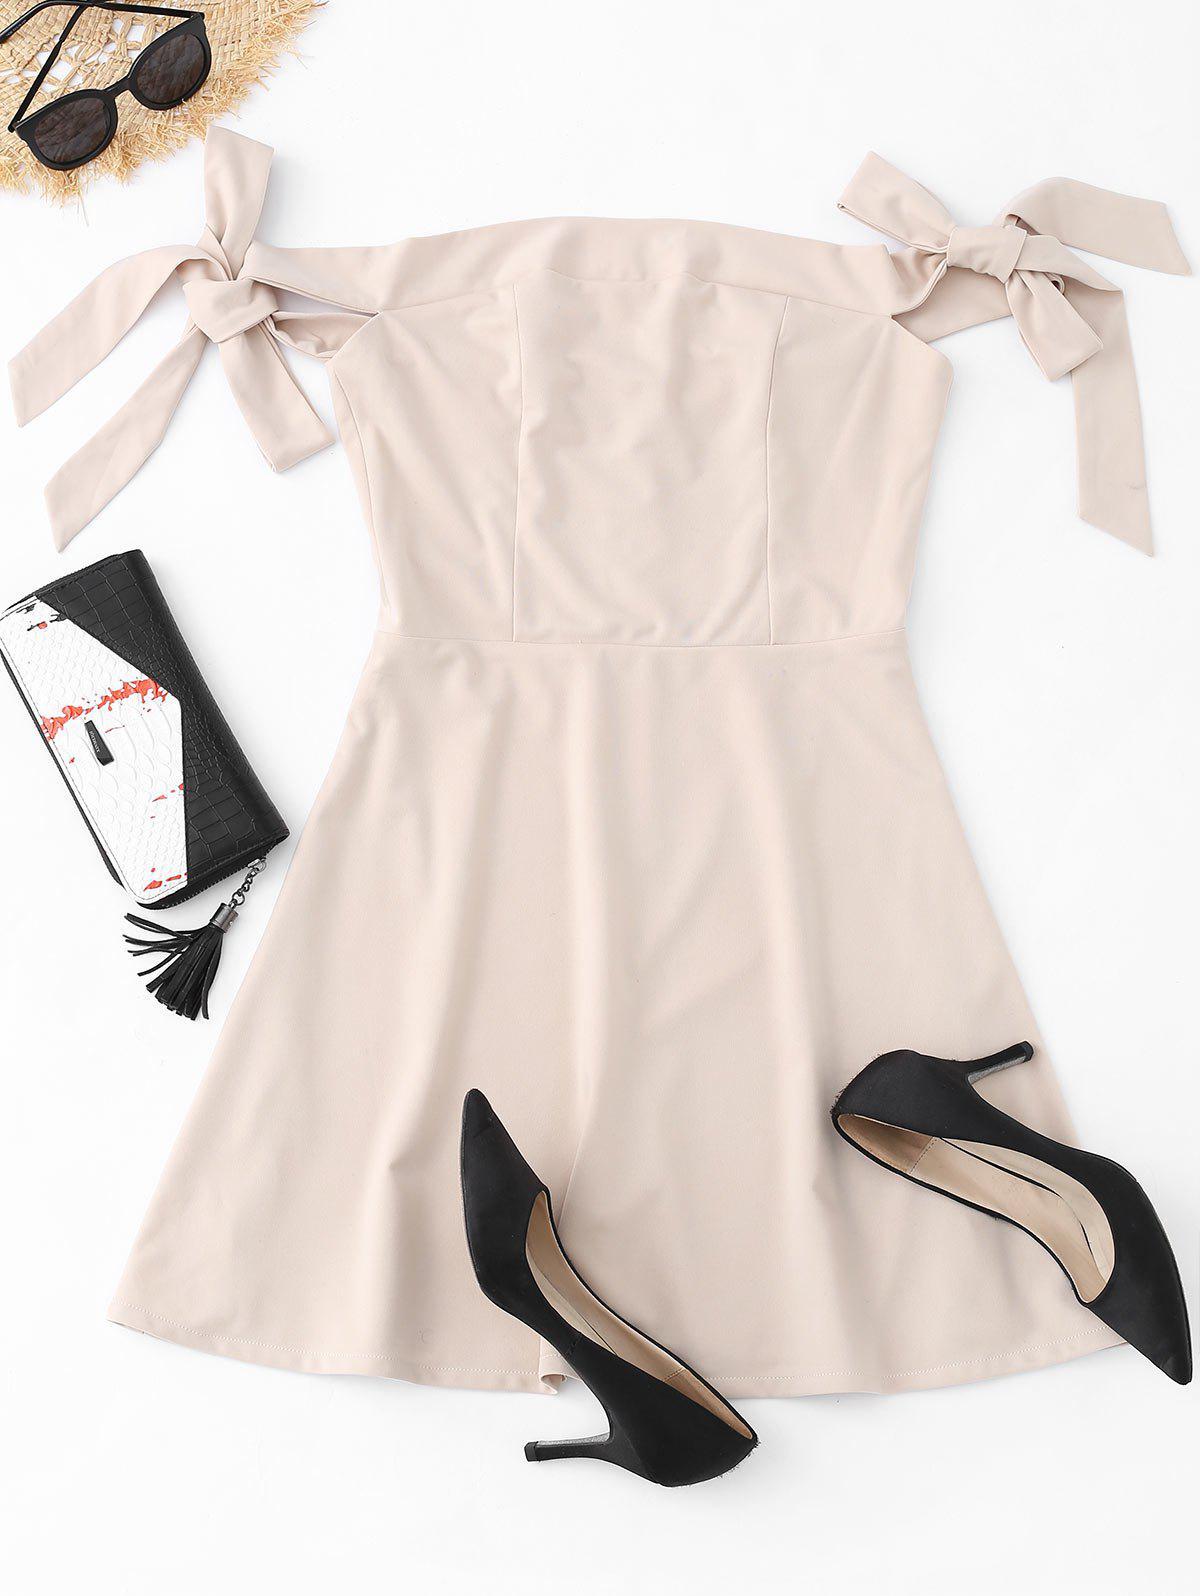 Off The Shoulder Bowknot Mini Dress 238821001